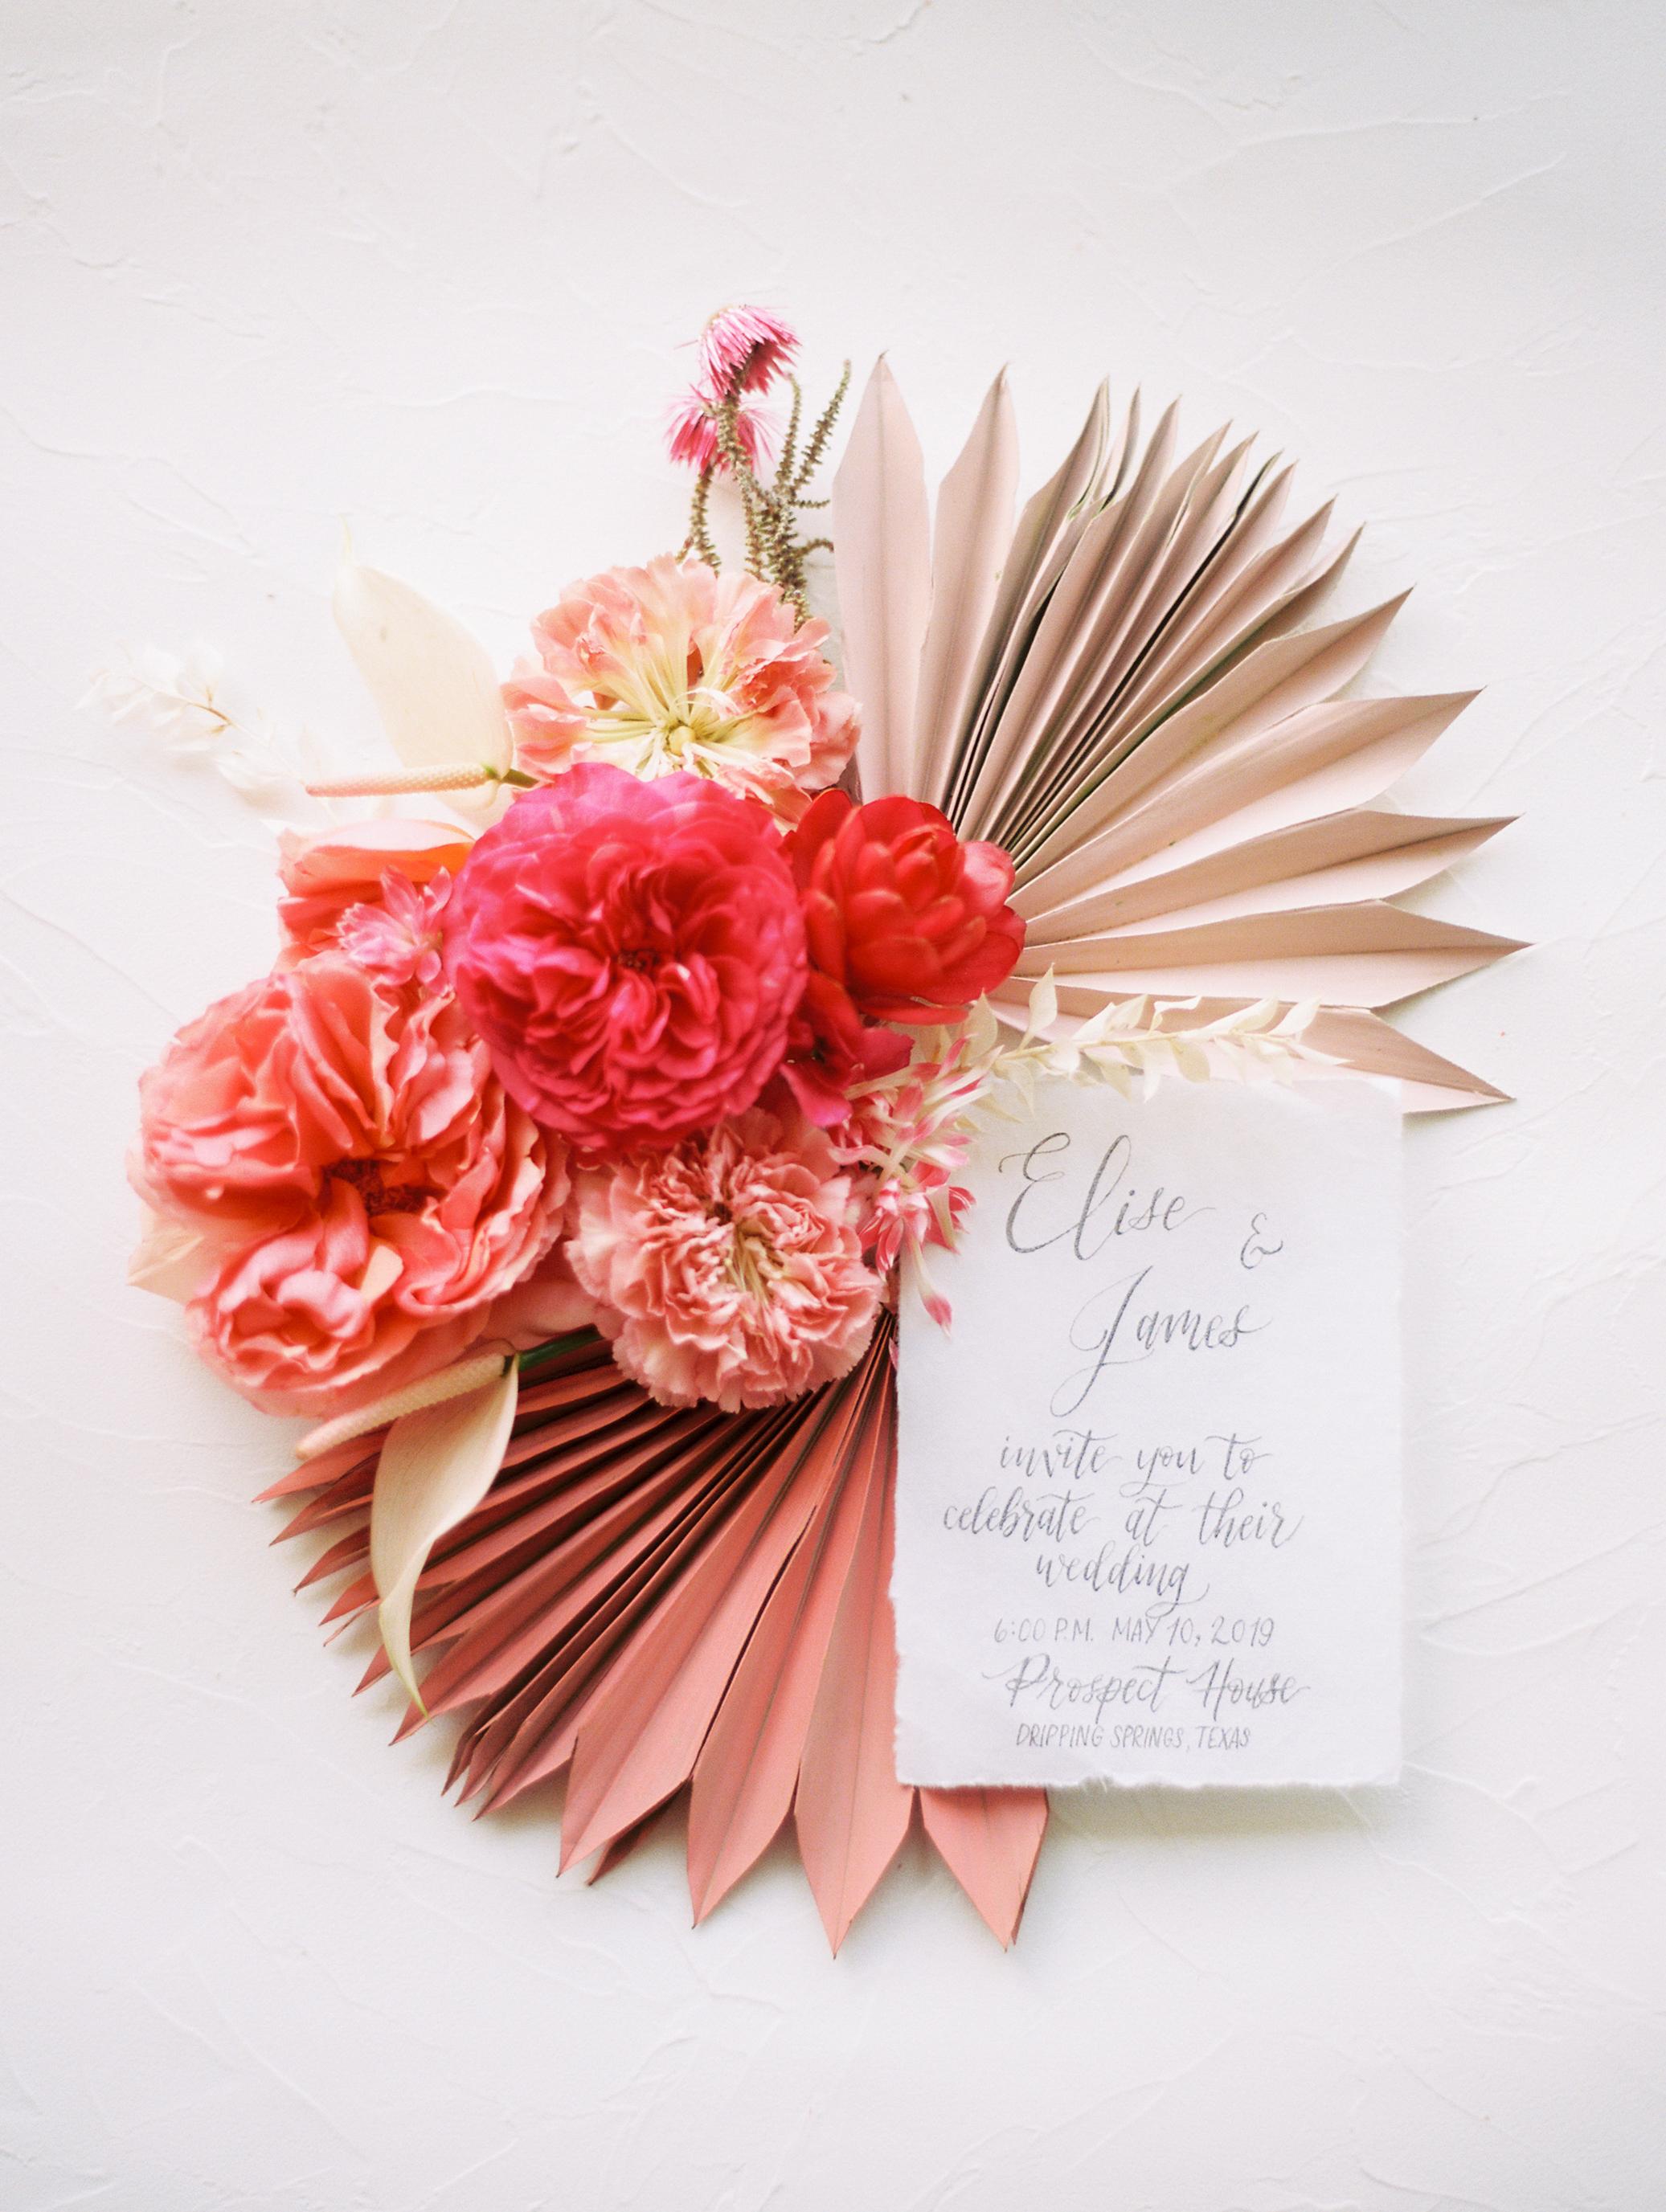 Kristin-La-Voie-Photography-Austin-Wedding-Photographer-Prospect-House-5.jpg